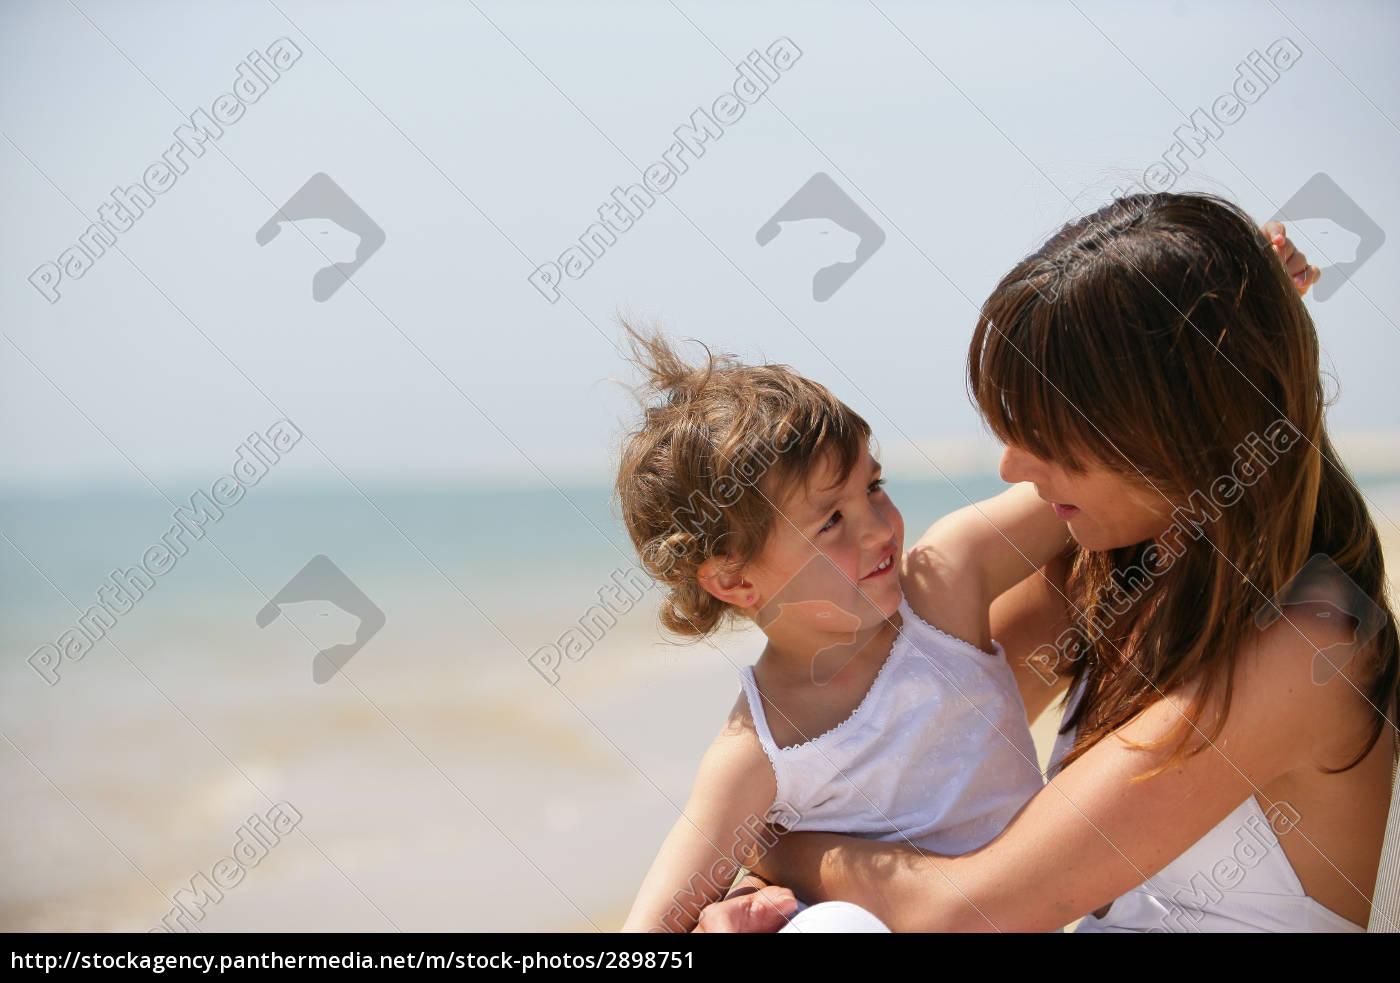 portrait, of, a, little, girl, sitting - 2898751